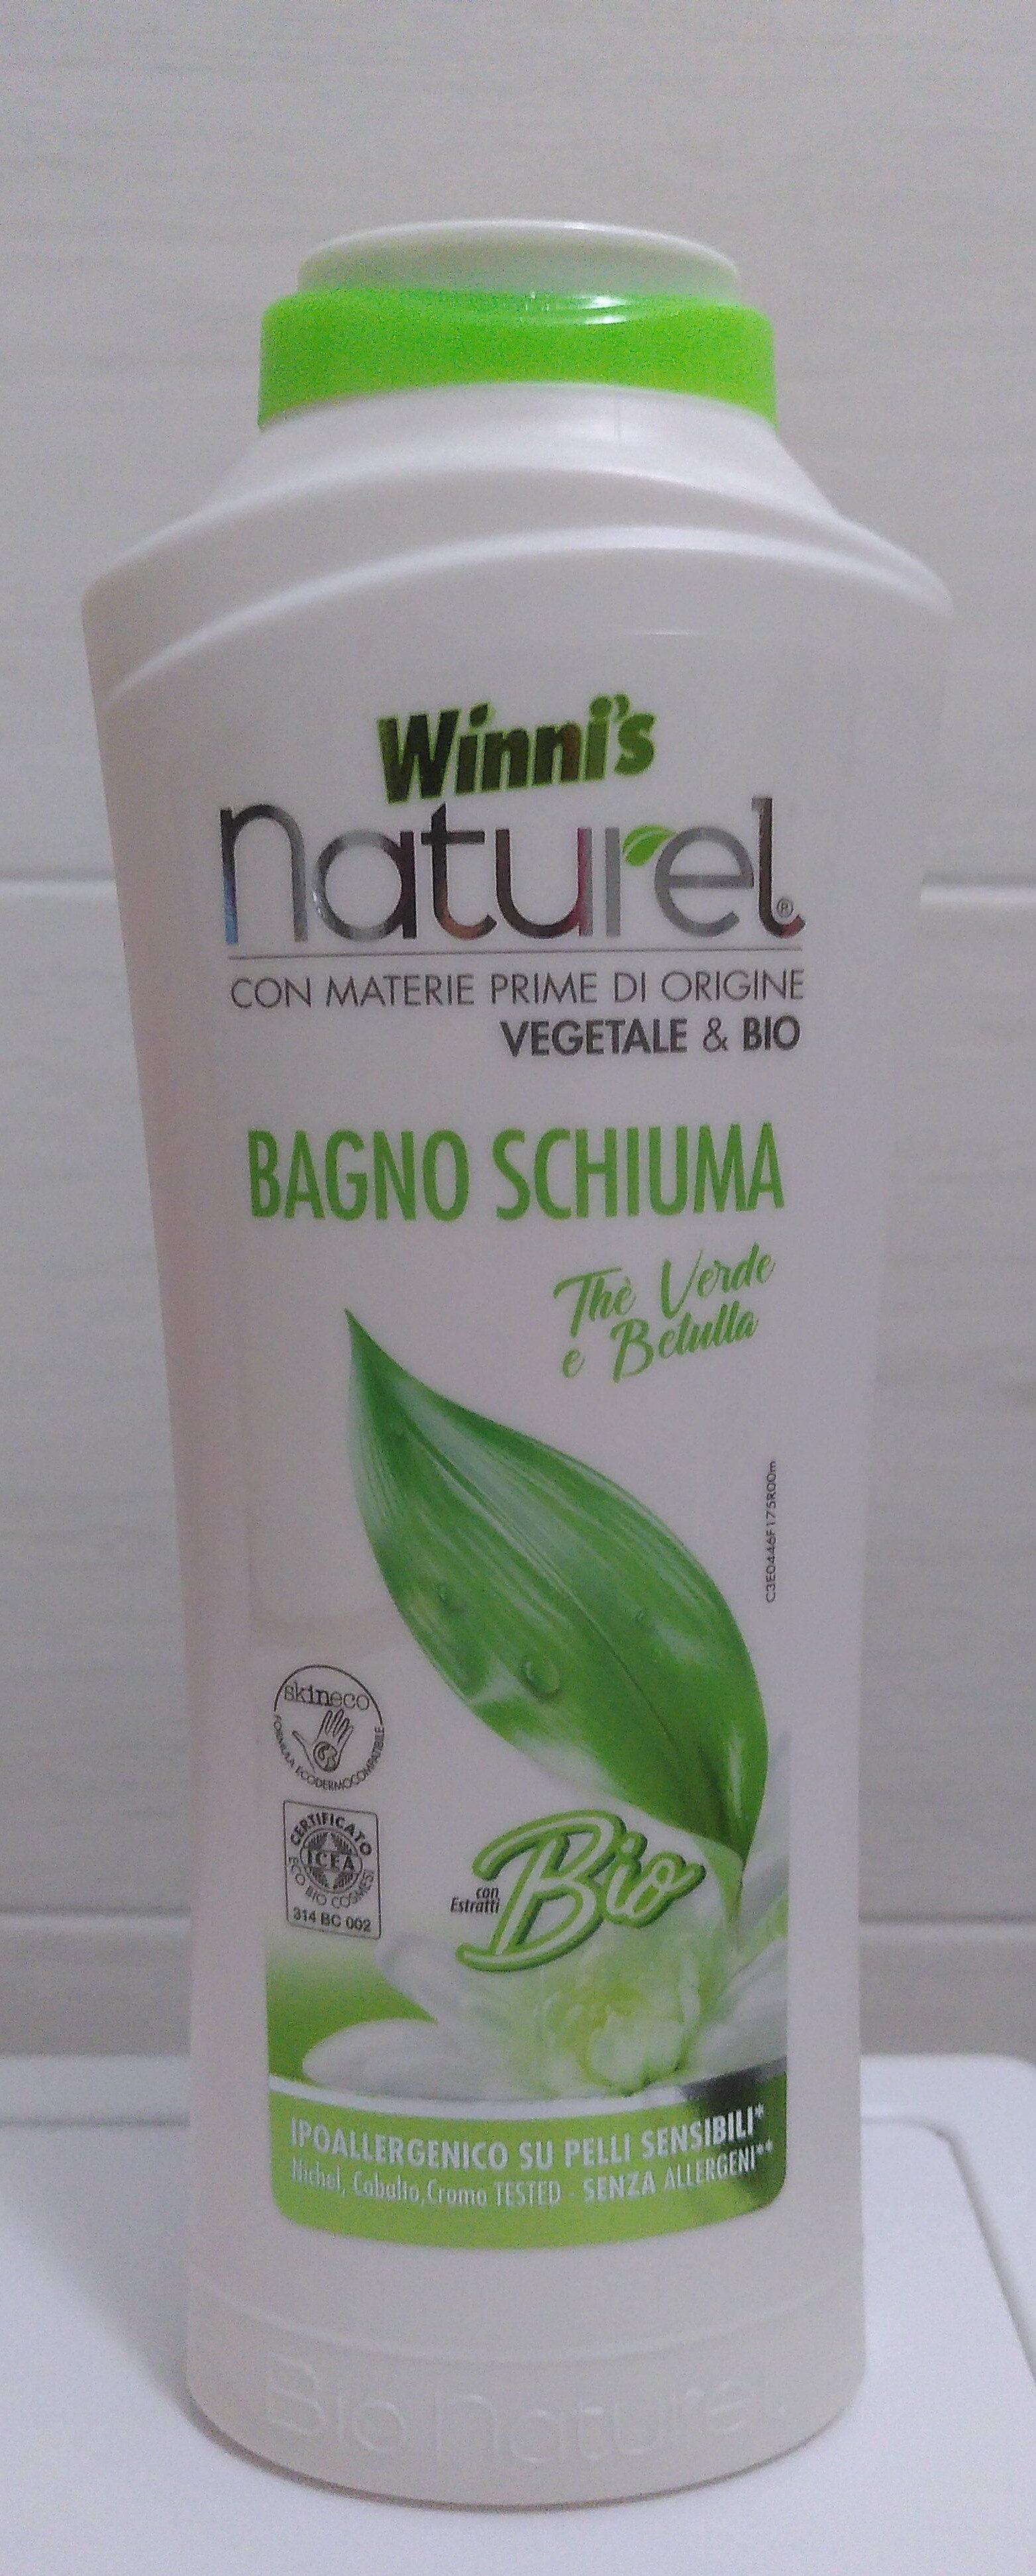 Bagno Schiuma Thè Verde e Betulla - Product - it